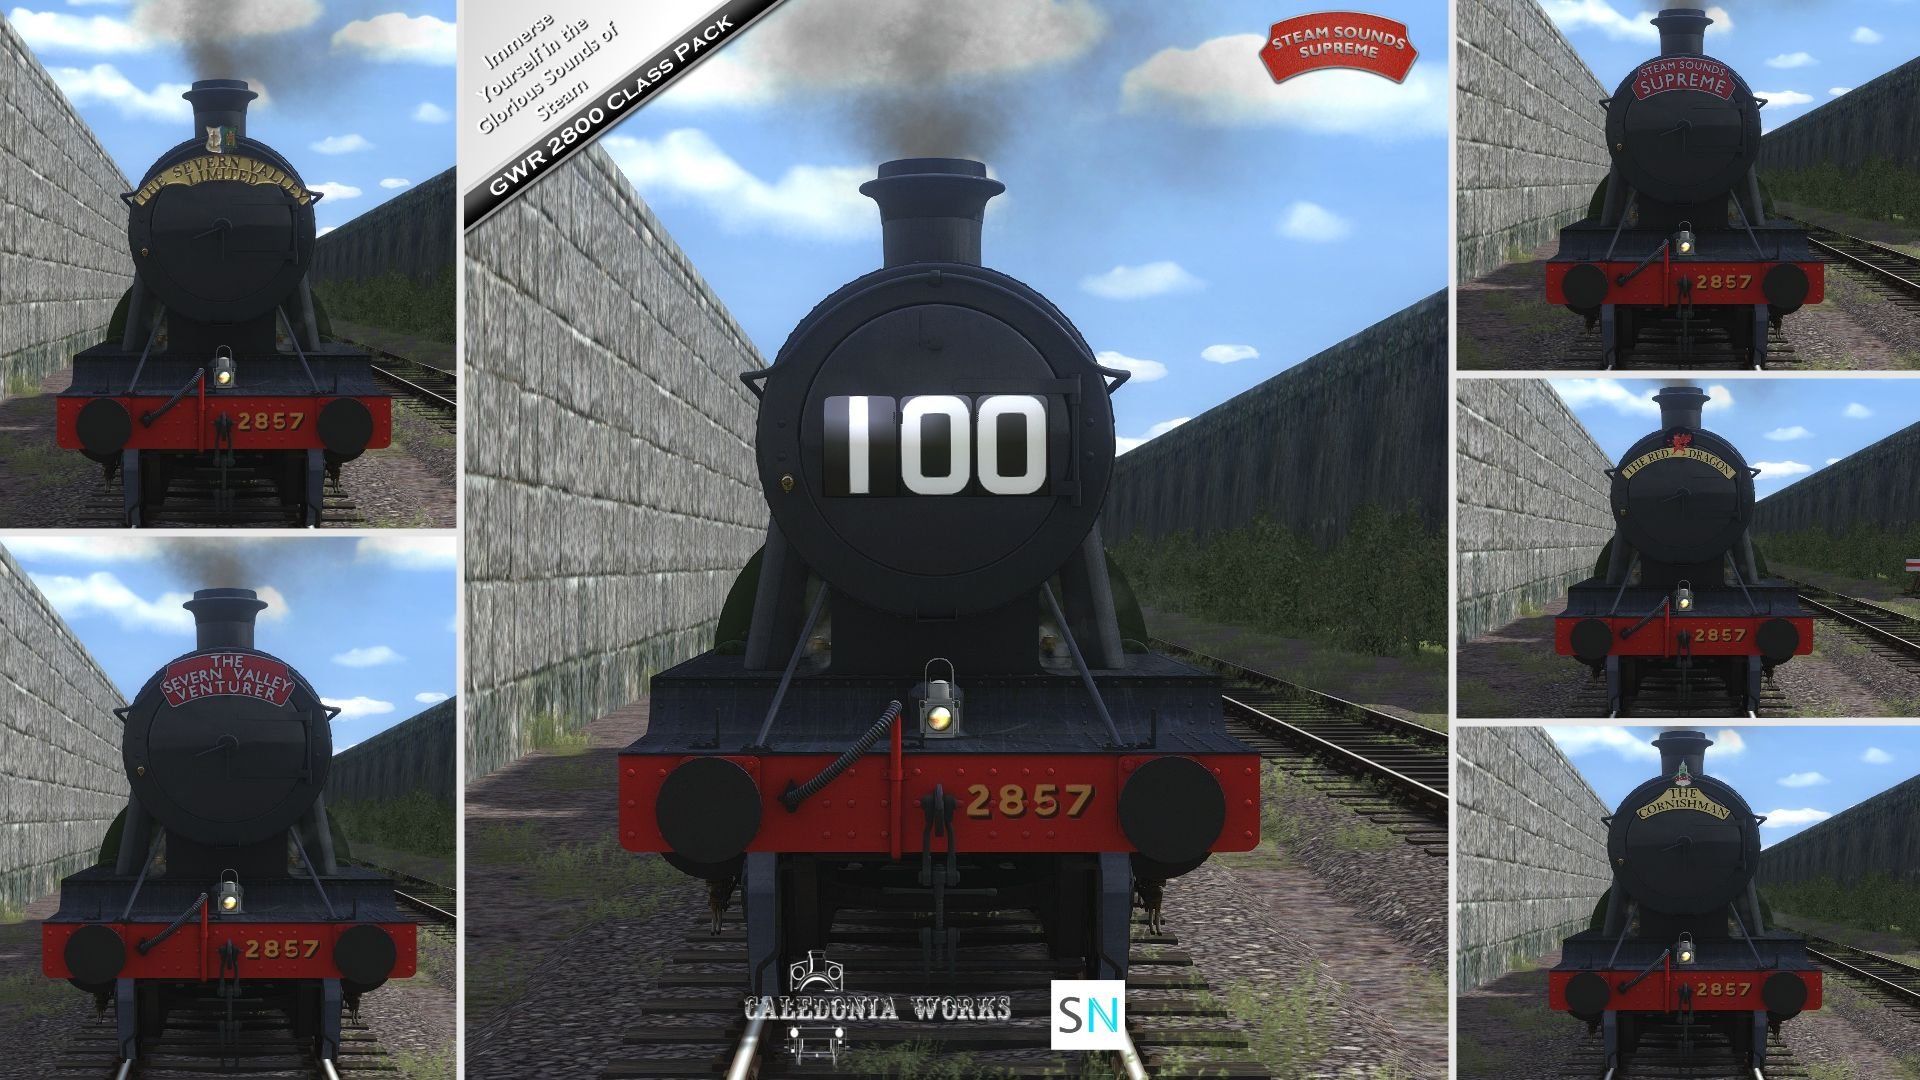 GWR2800Pack64.jpg